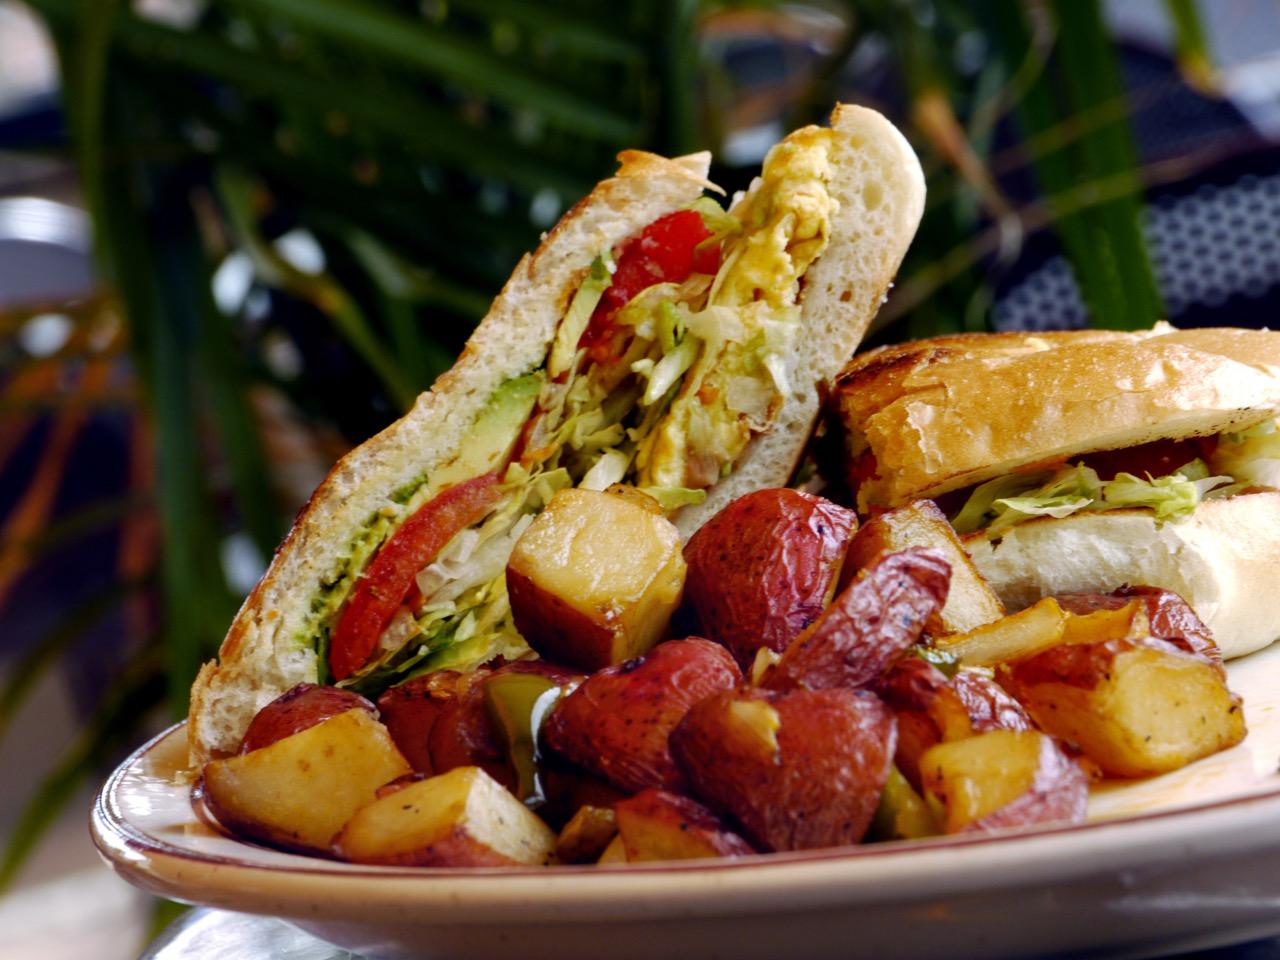 mexican-food-la-canada - 8